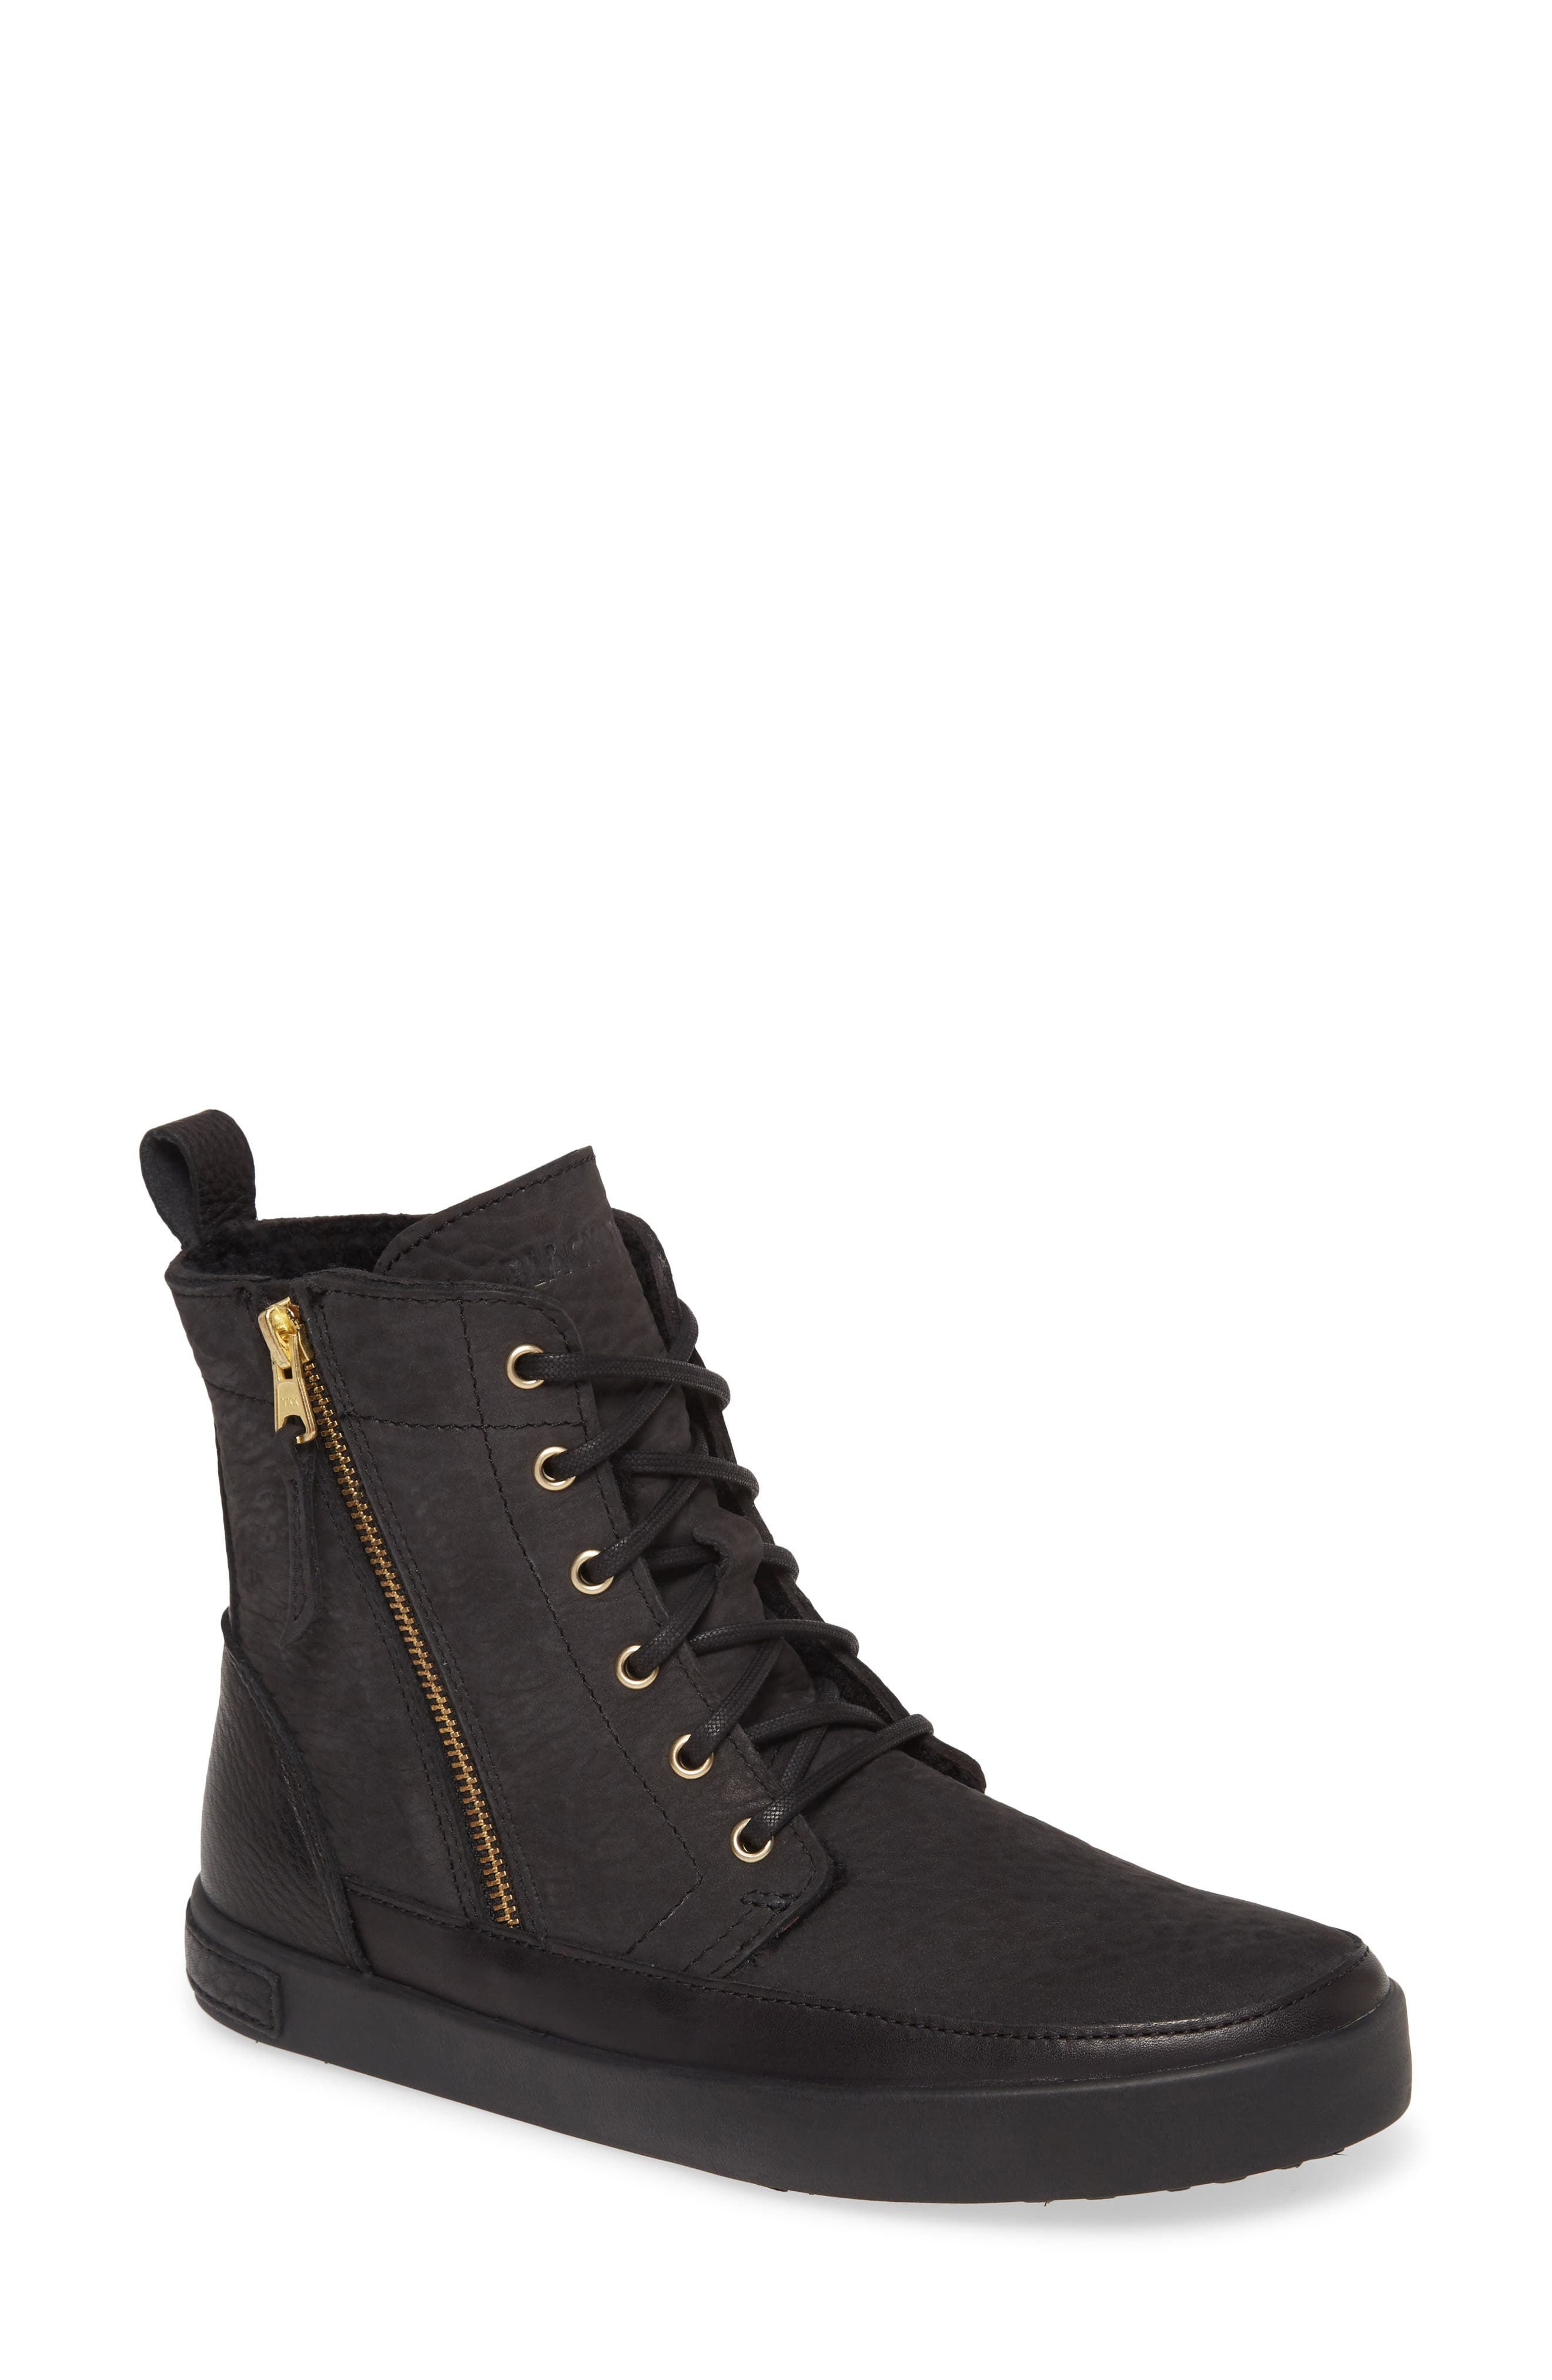 Women's Blackstone Shoes | Nordstrom